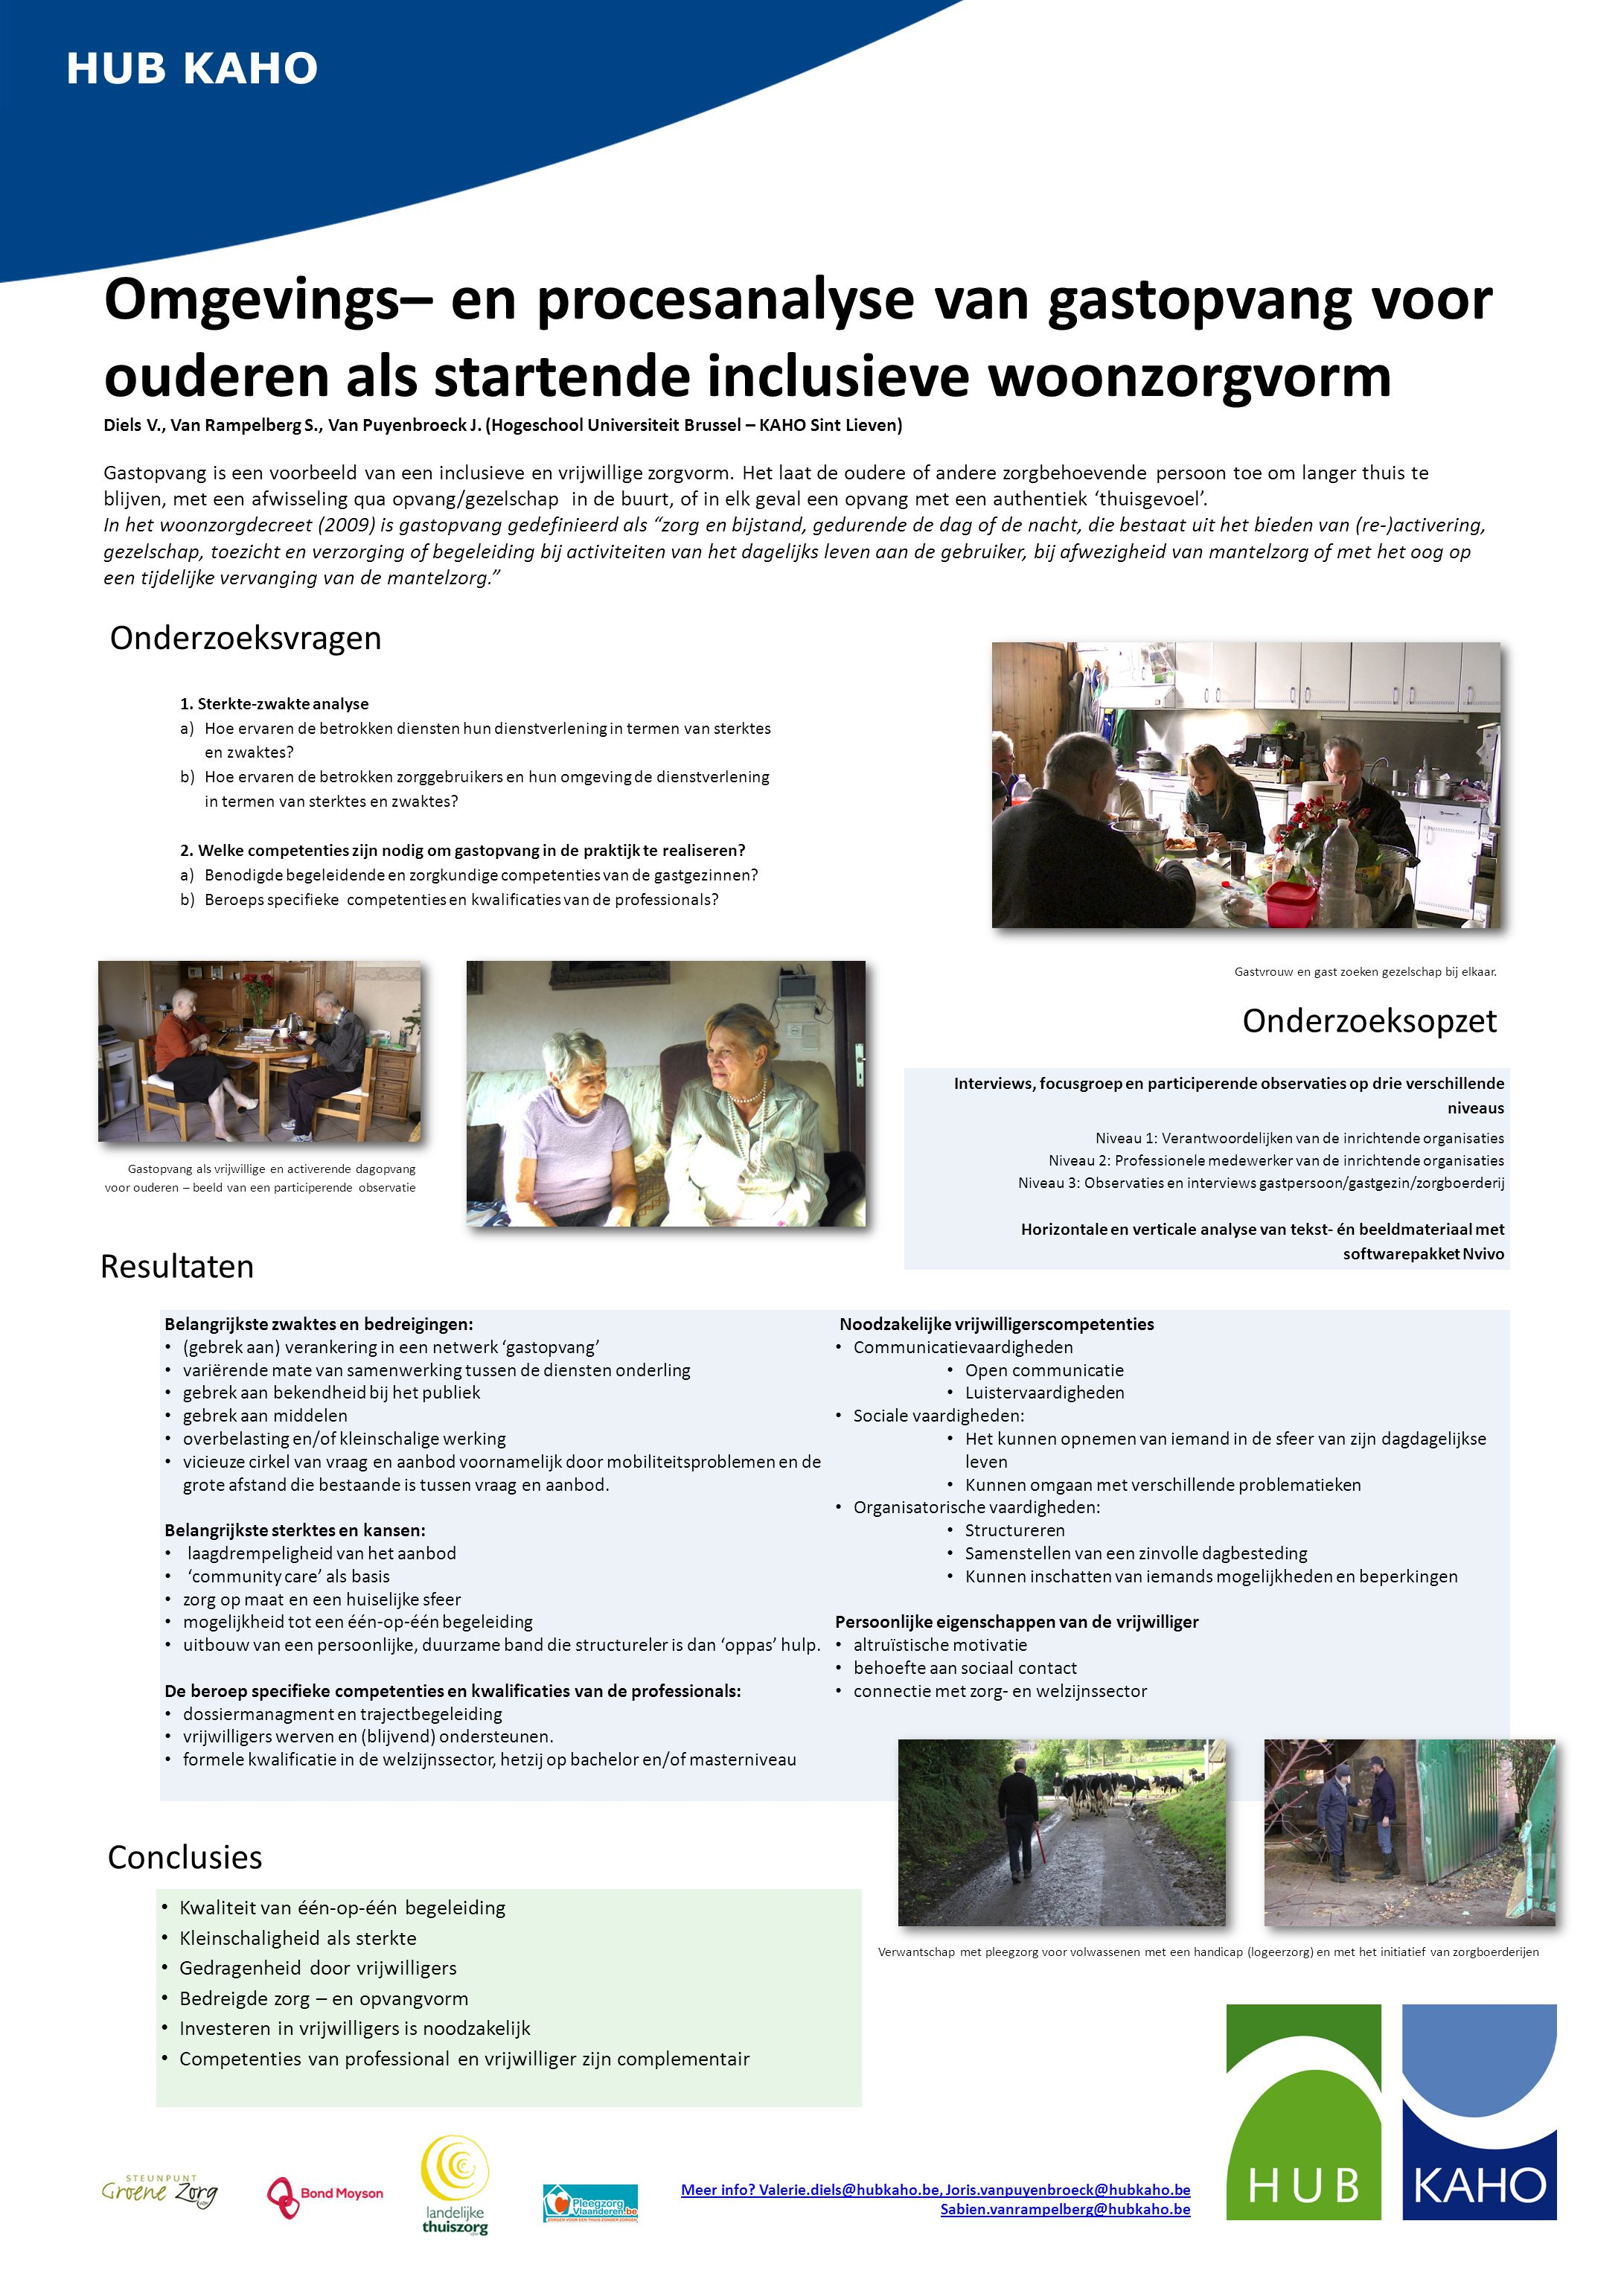 HUB KAHO Omgevings– en procesanalyse van gastopvang voor ouderen als startende inclusieve woonzorgvorm.